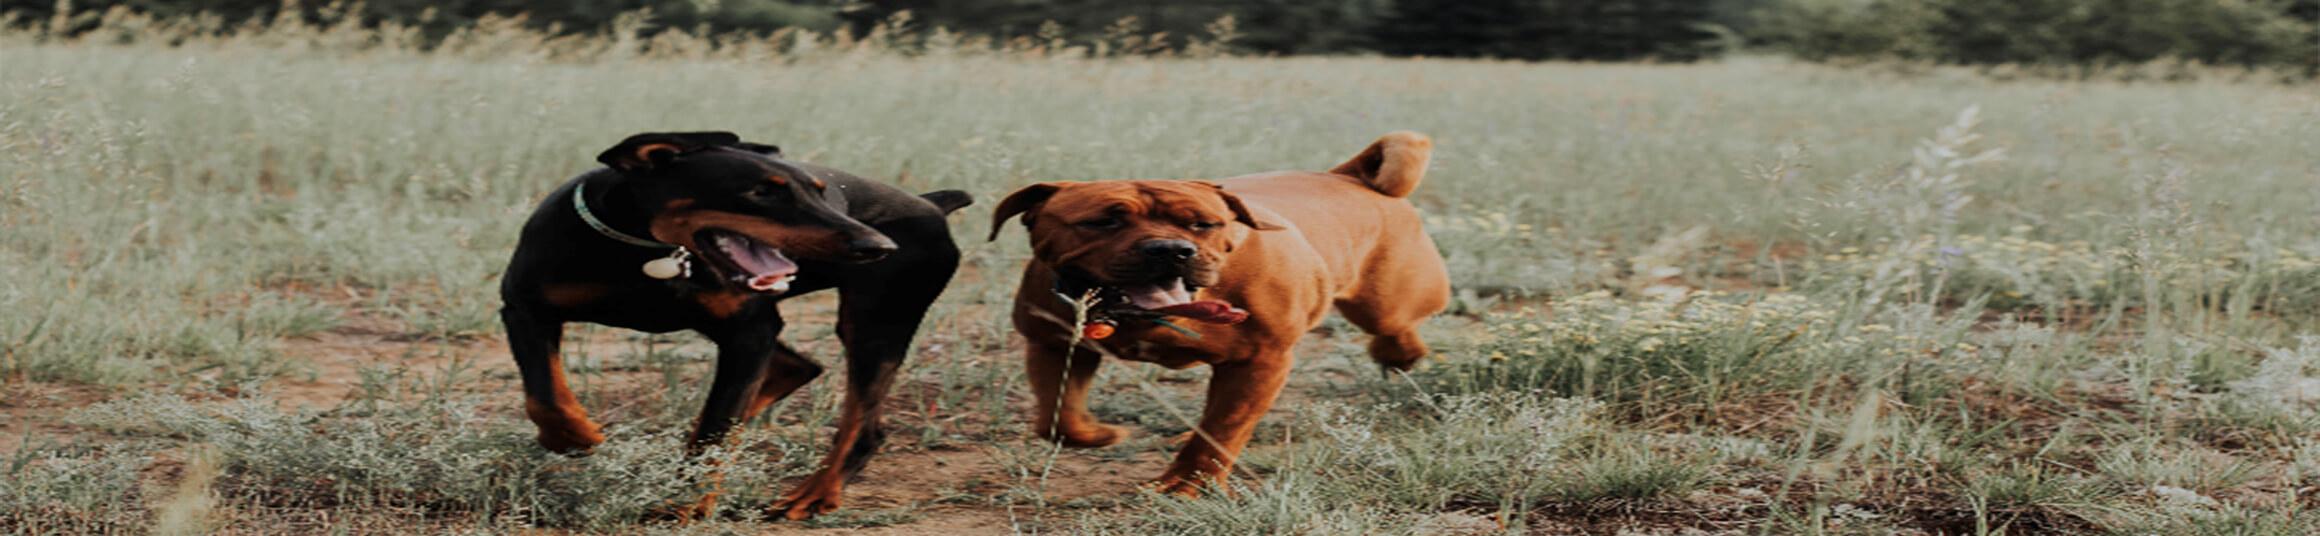 Custom Dogs Tubman